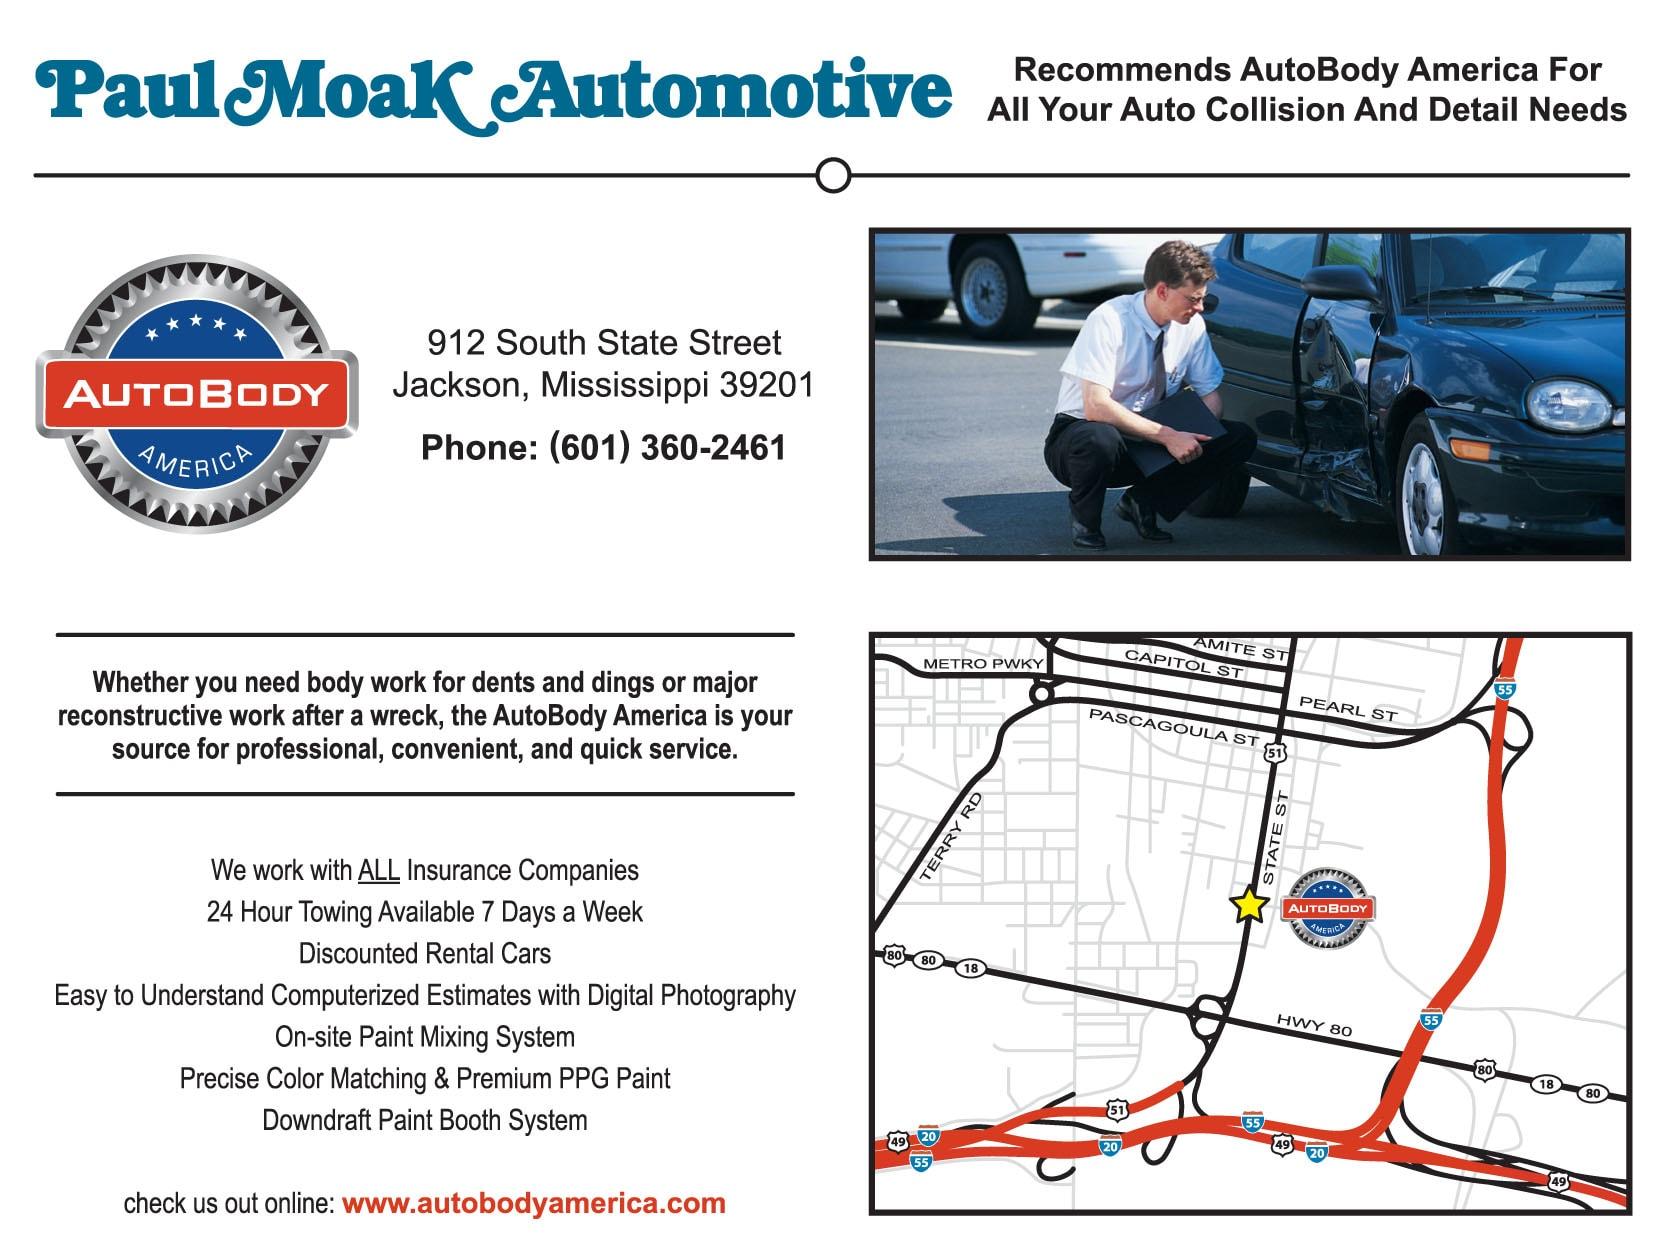 Honda Dealership Jackson Ms >> Used Nissan Maxima For Sale Jackson Ms Cargurus Autos Post